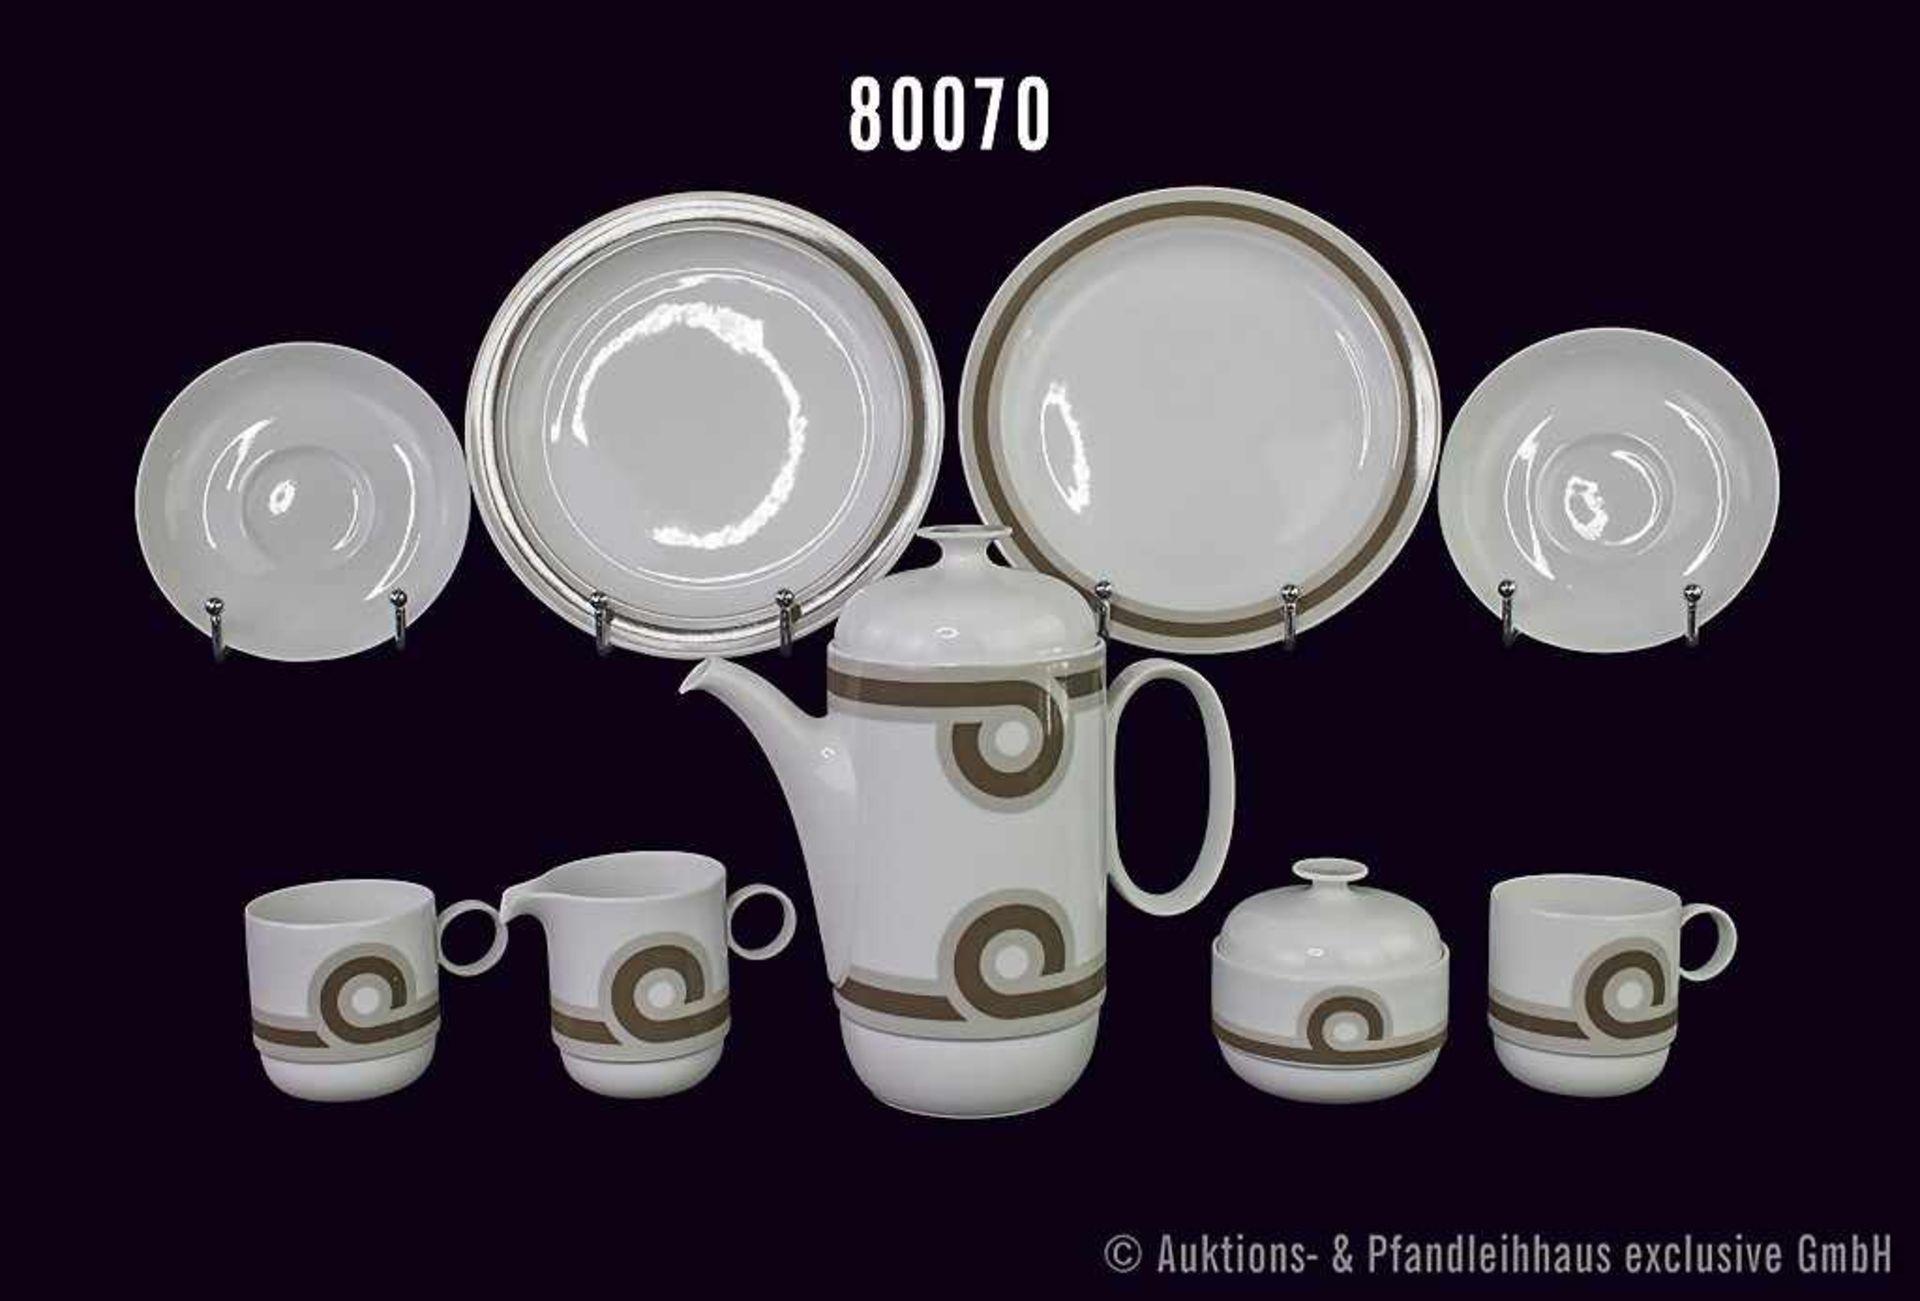 Konv. Rosenthal Porzellan Kaffee-Service 6-teilig, studio-linie, Form duo, Künstler Ambrogio Pozzi